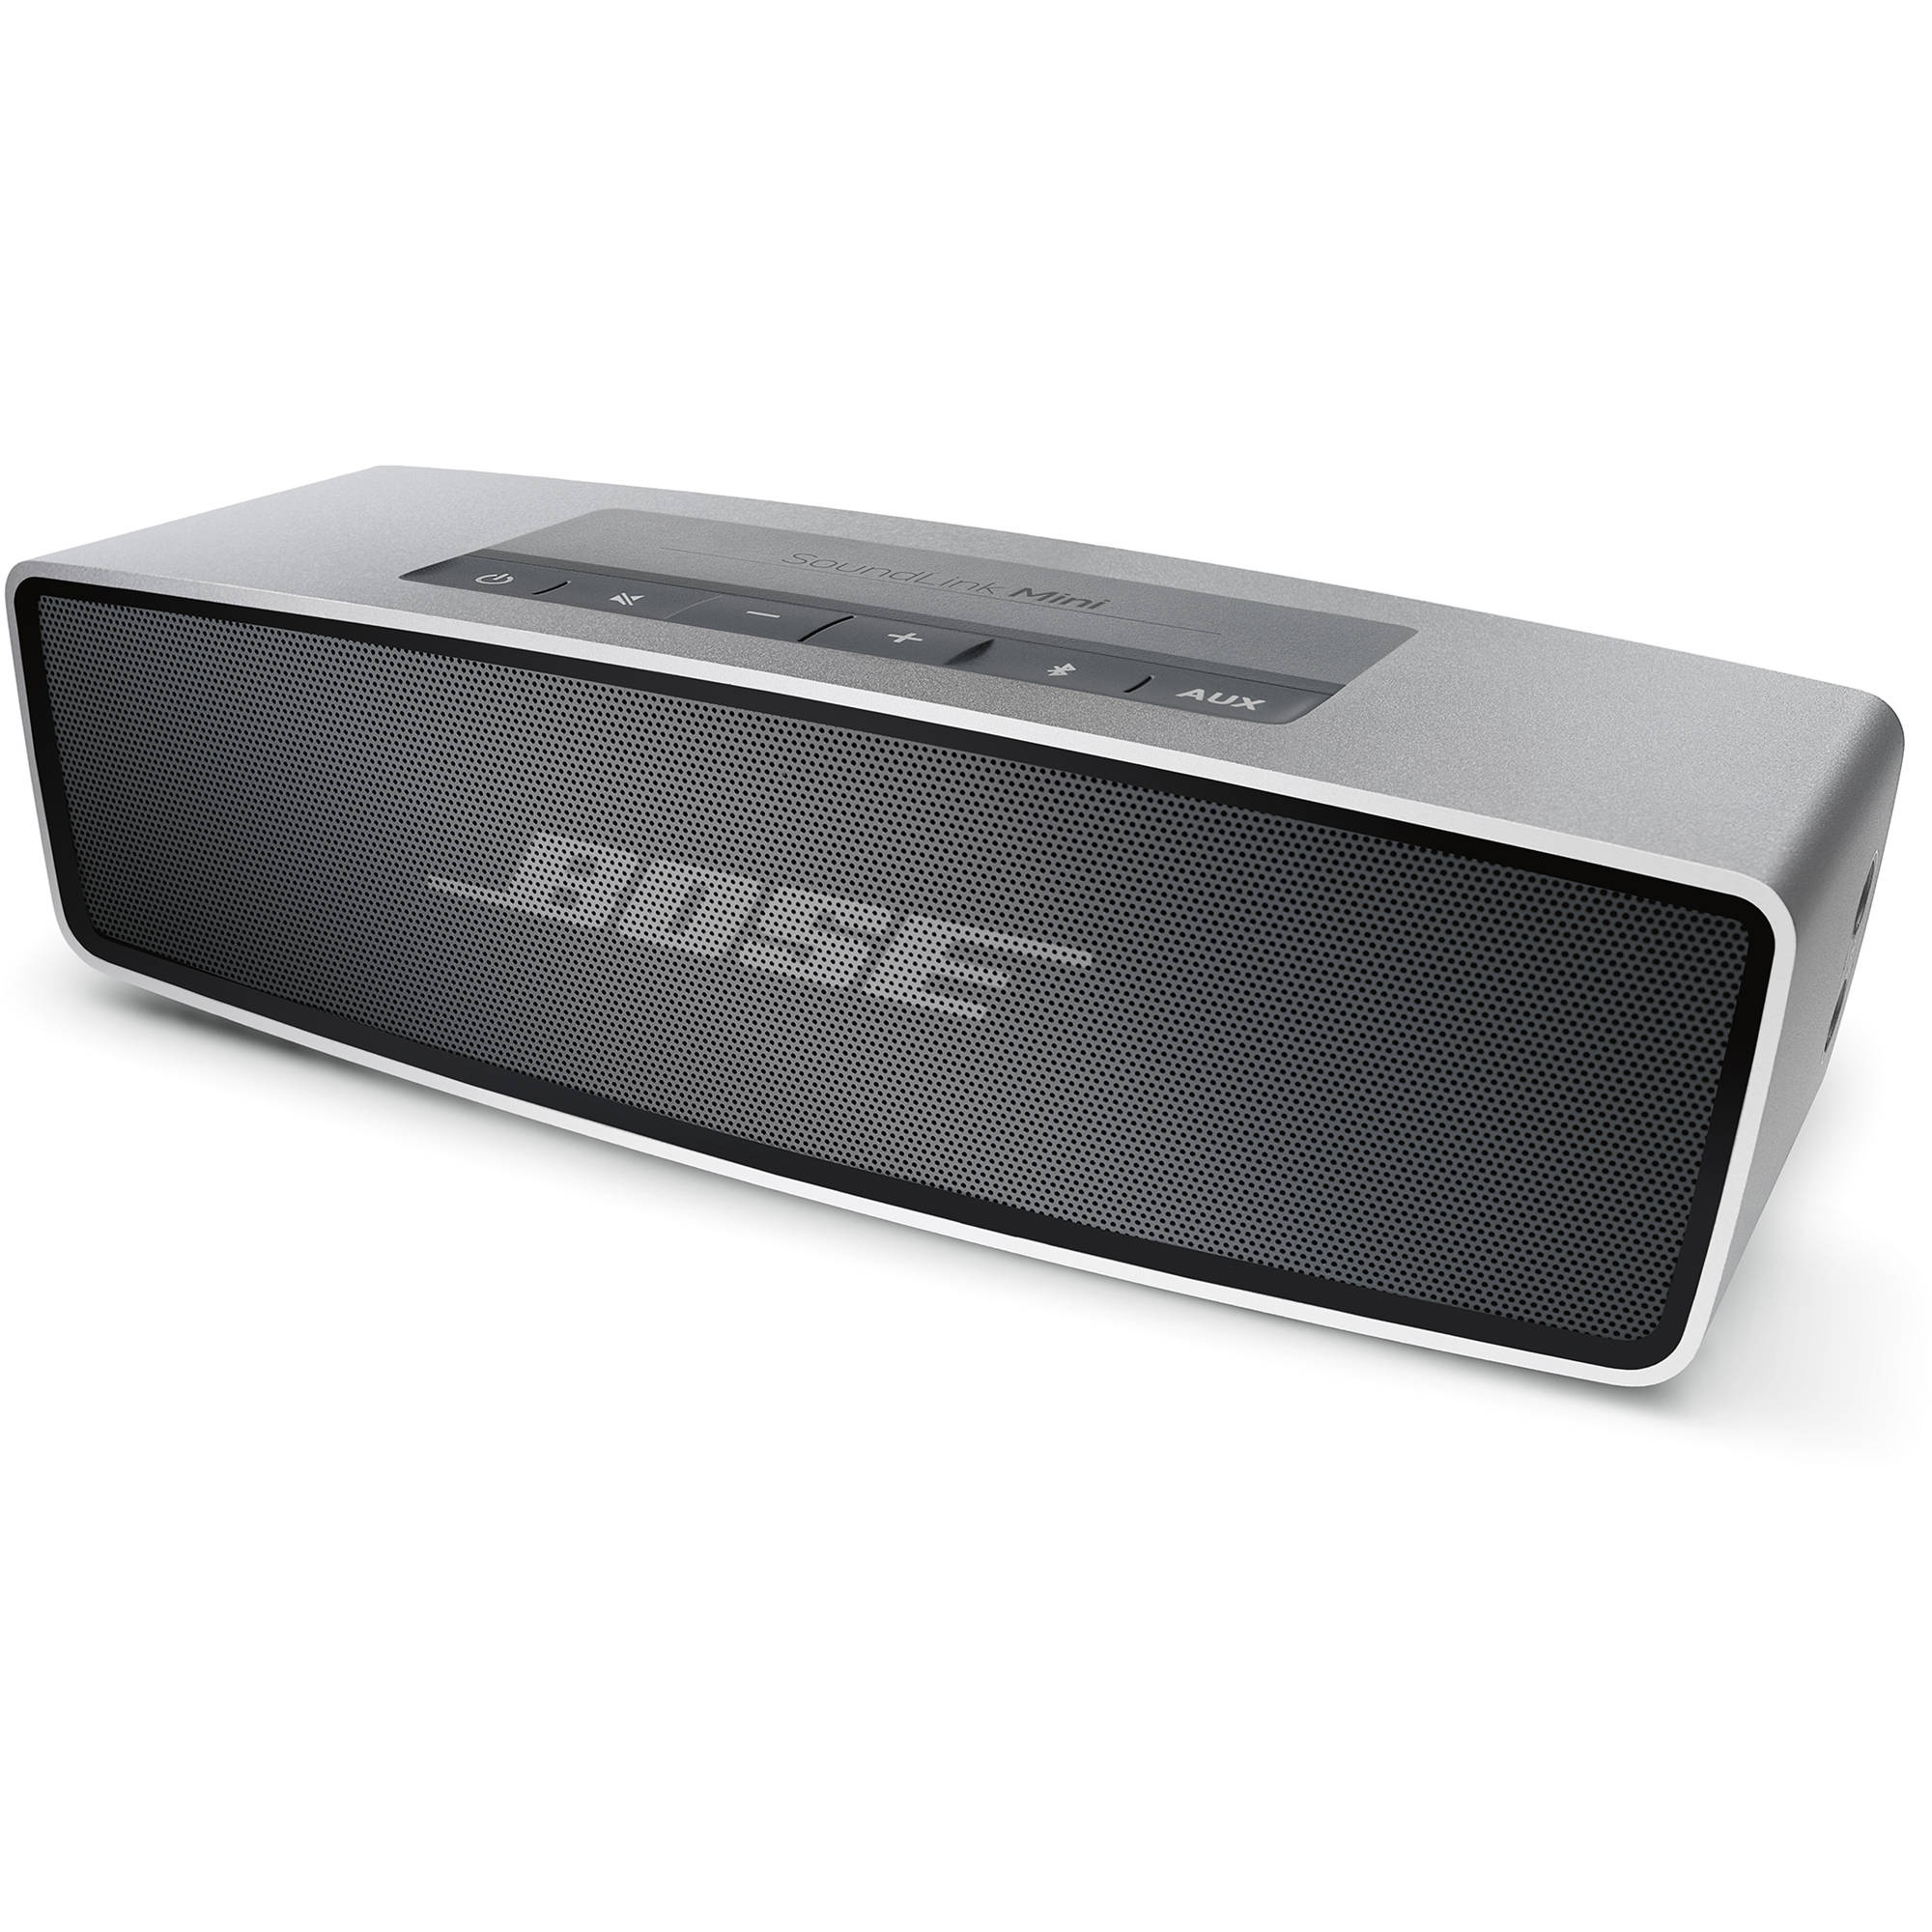 Bose SoundLink Mini Bluetooth Speaker 359037-1300 B&H Photo